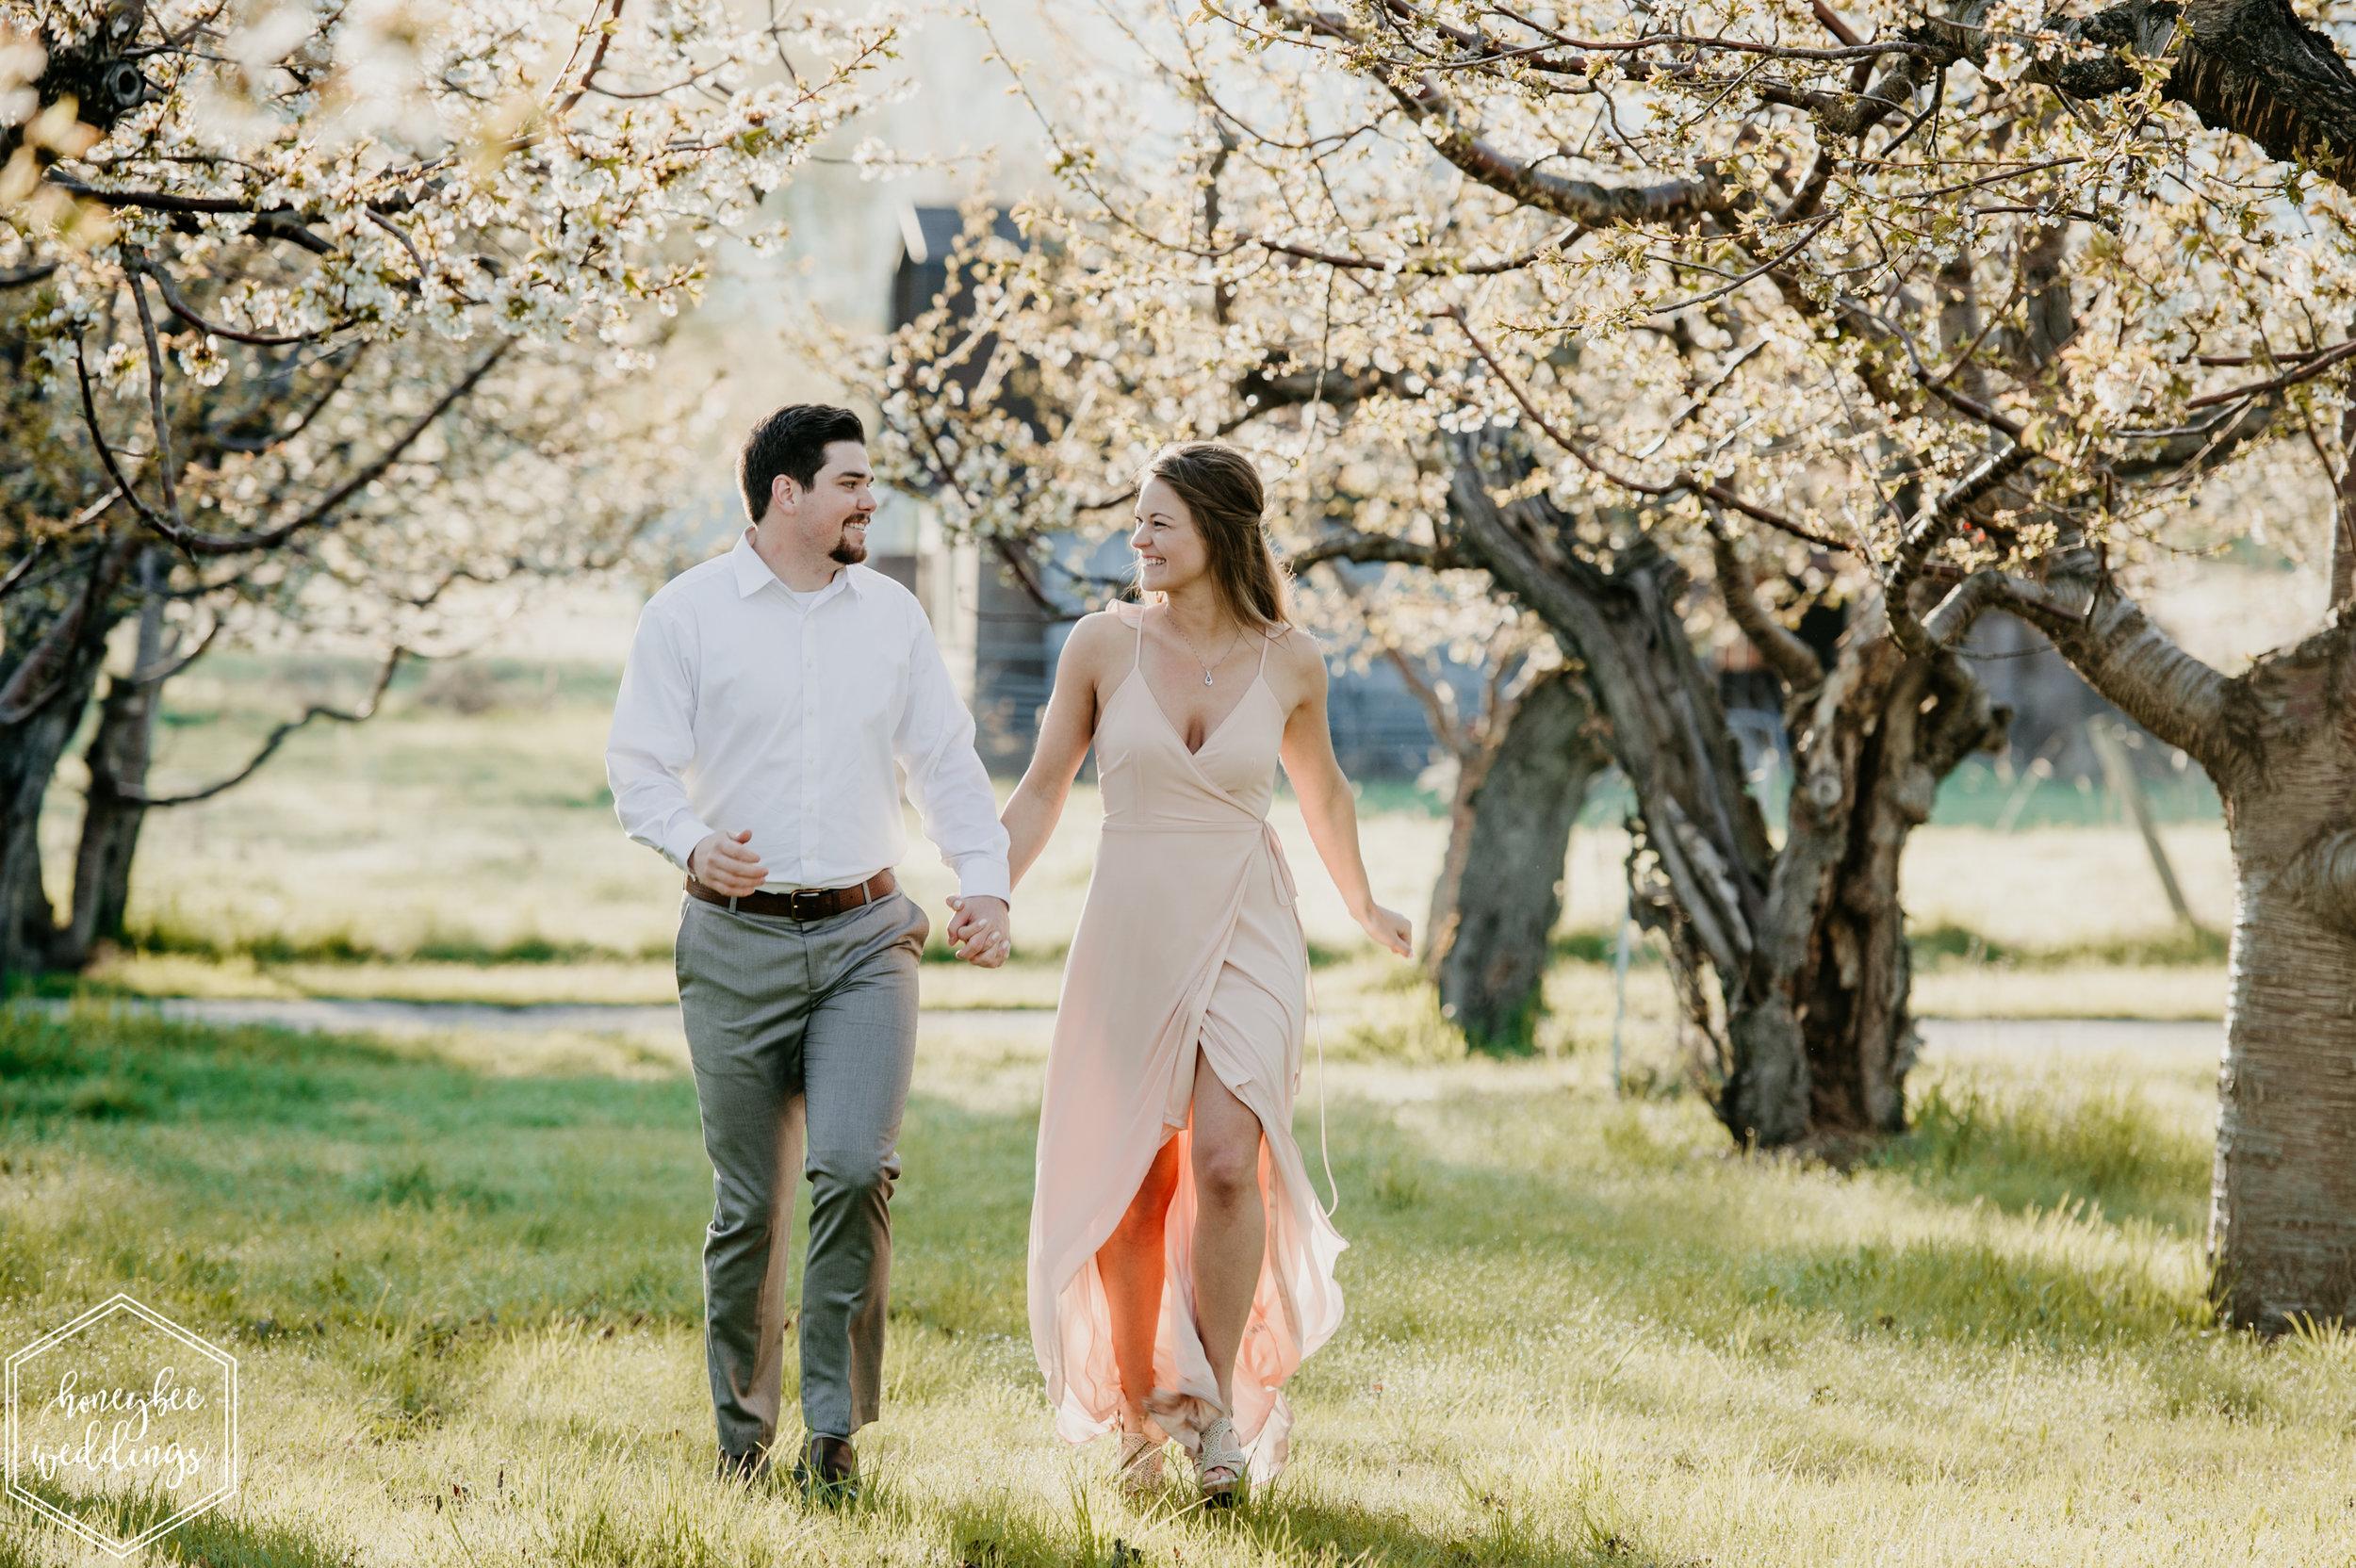 164Montana Wedding Photographer_Cherry Blossom Engagement Session_Ashlin & Luke_Honeybee Weddings_May 11, 2019-238.jpg